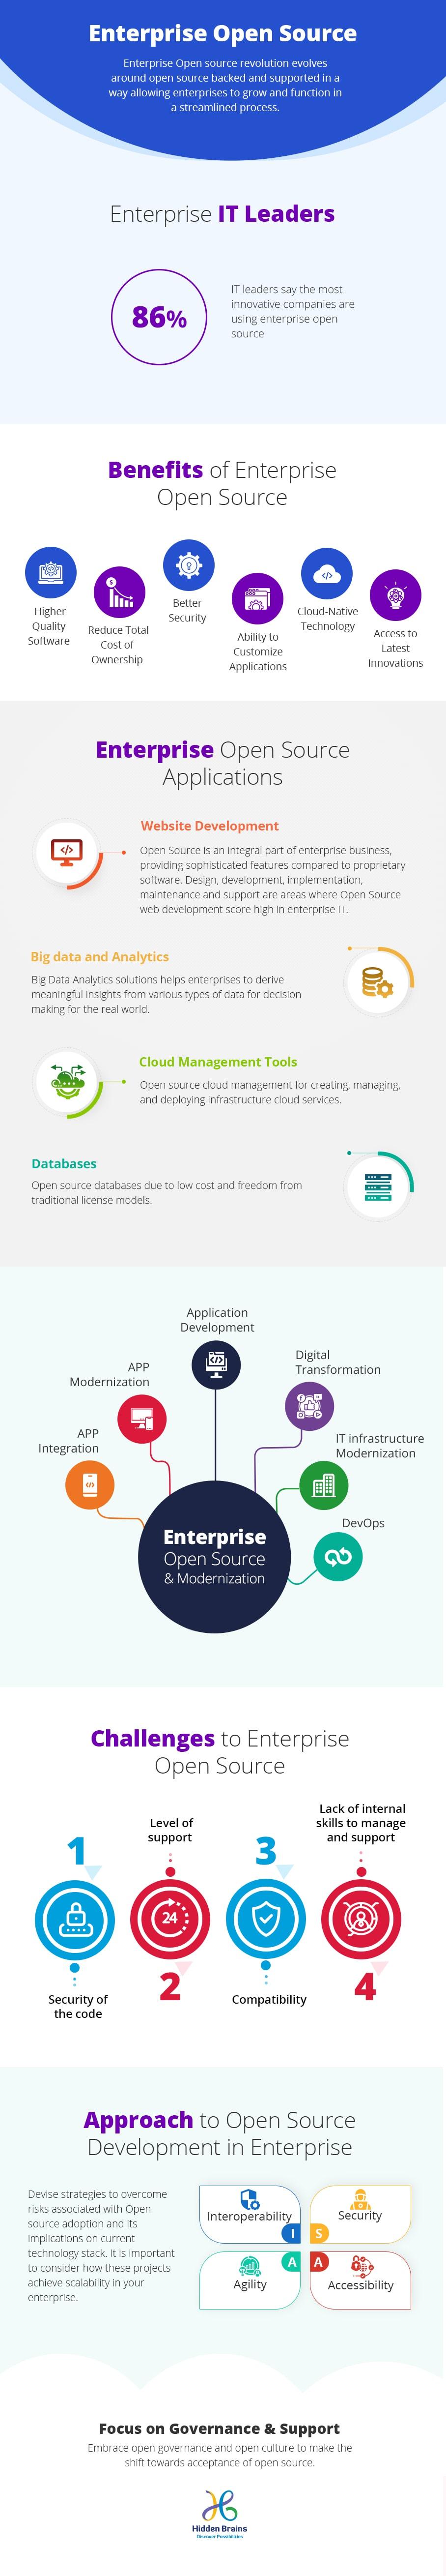 Open Source Web Application Development in Enterprises